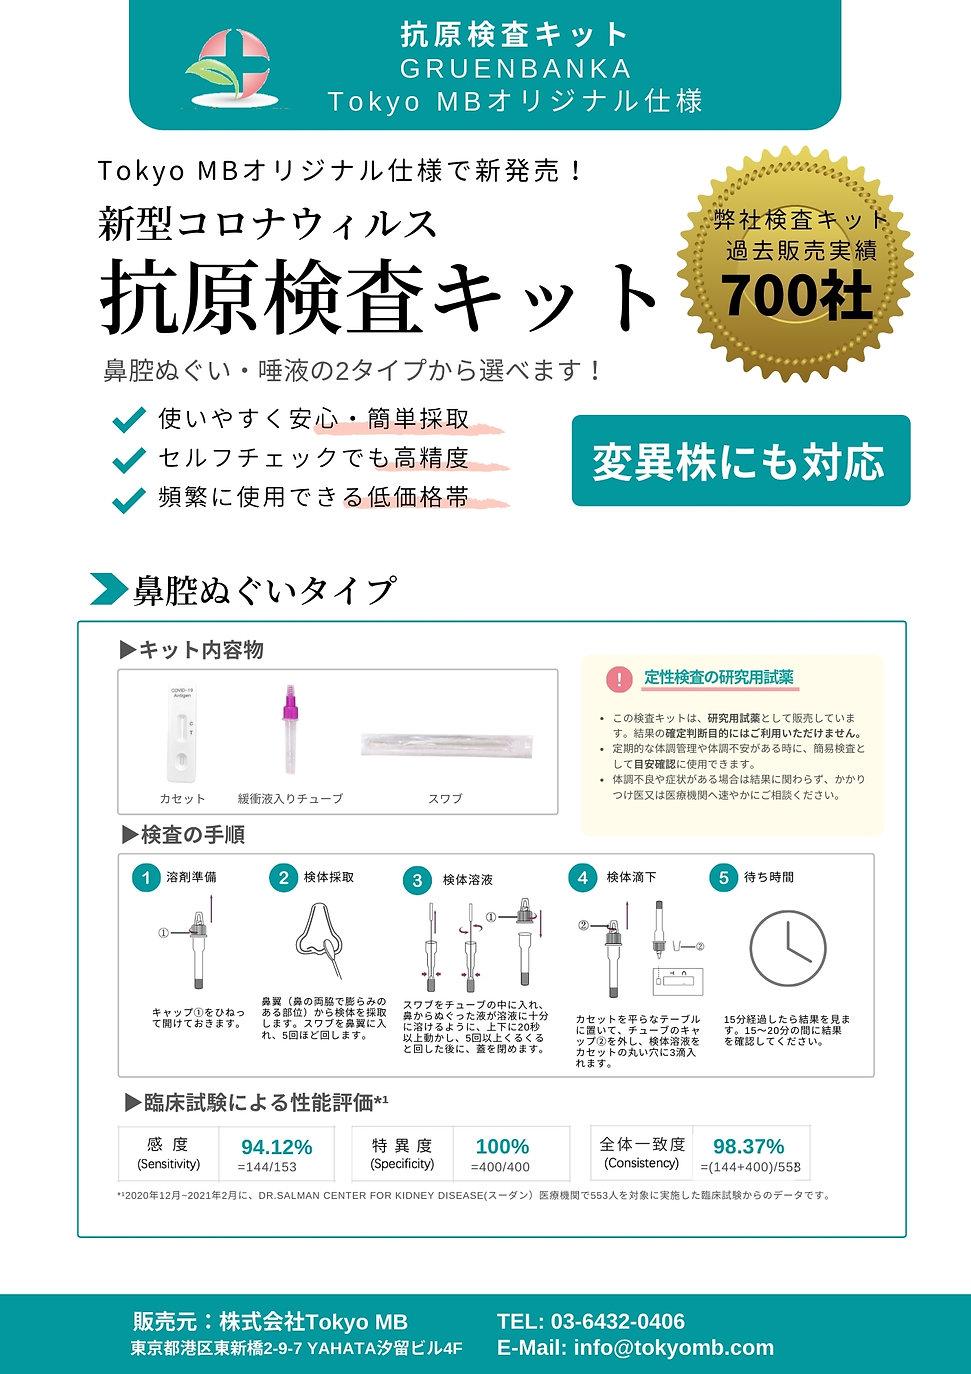 ★GRUENBANKA抗原検査キットチラシ(鼻腔・唾液).jpg